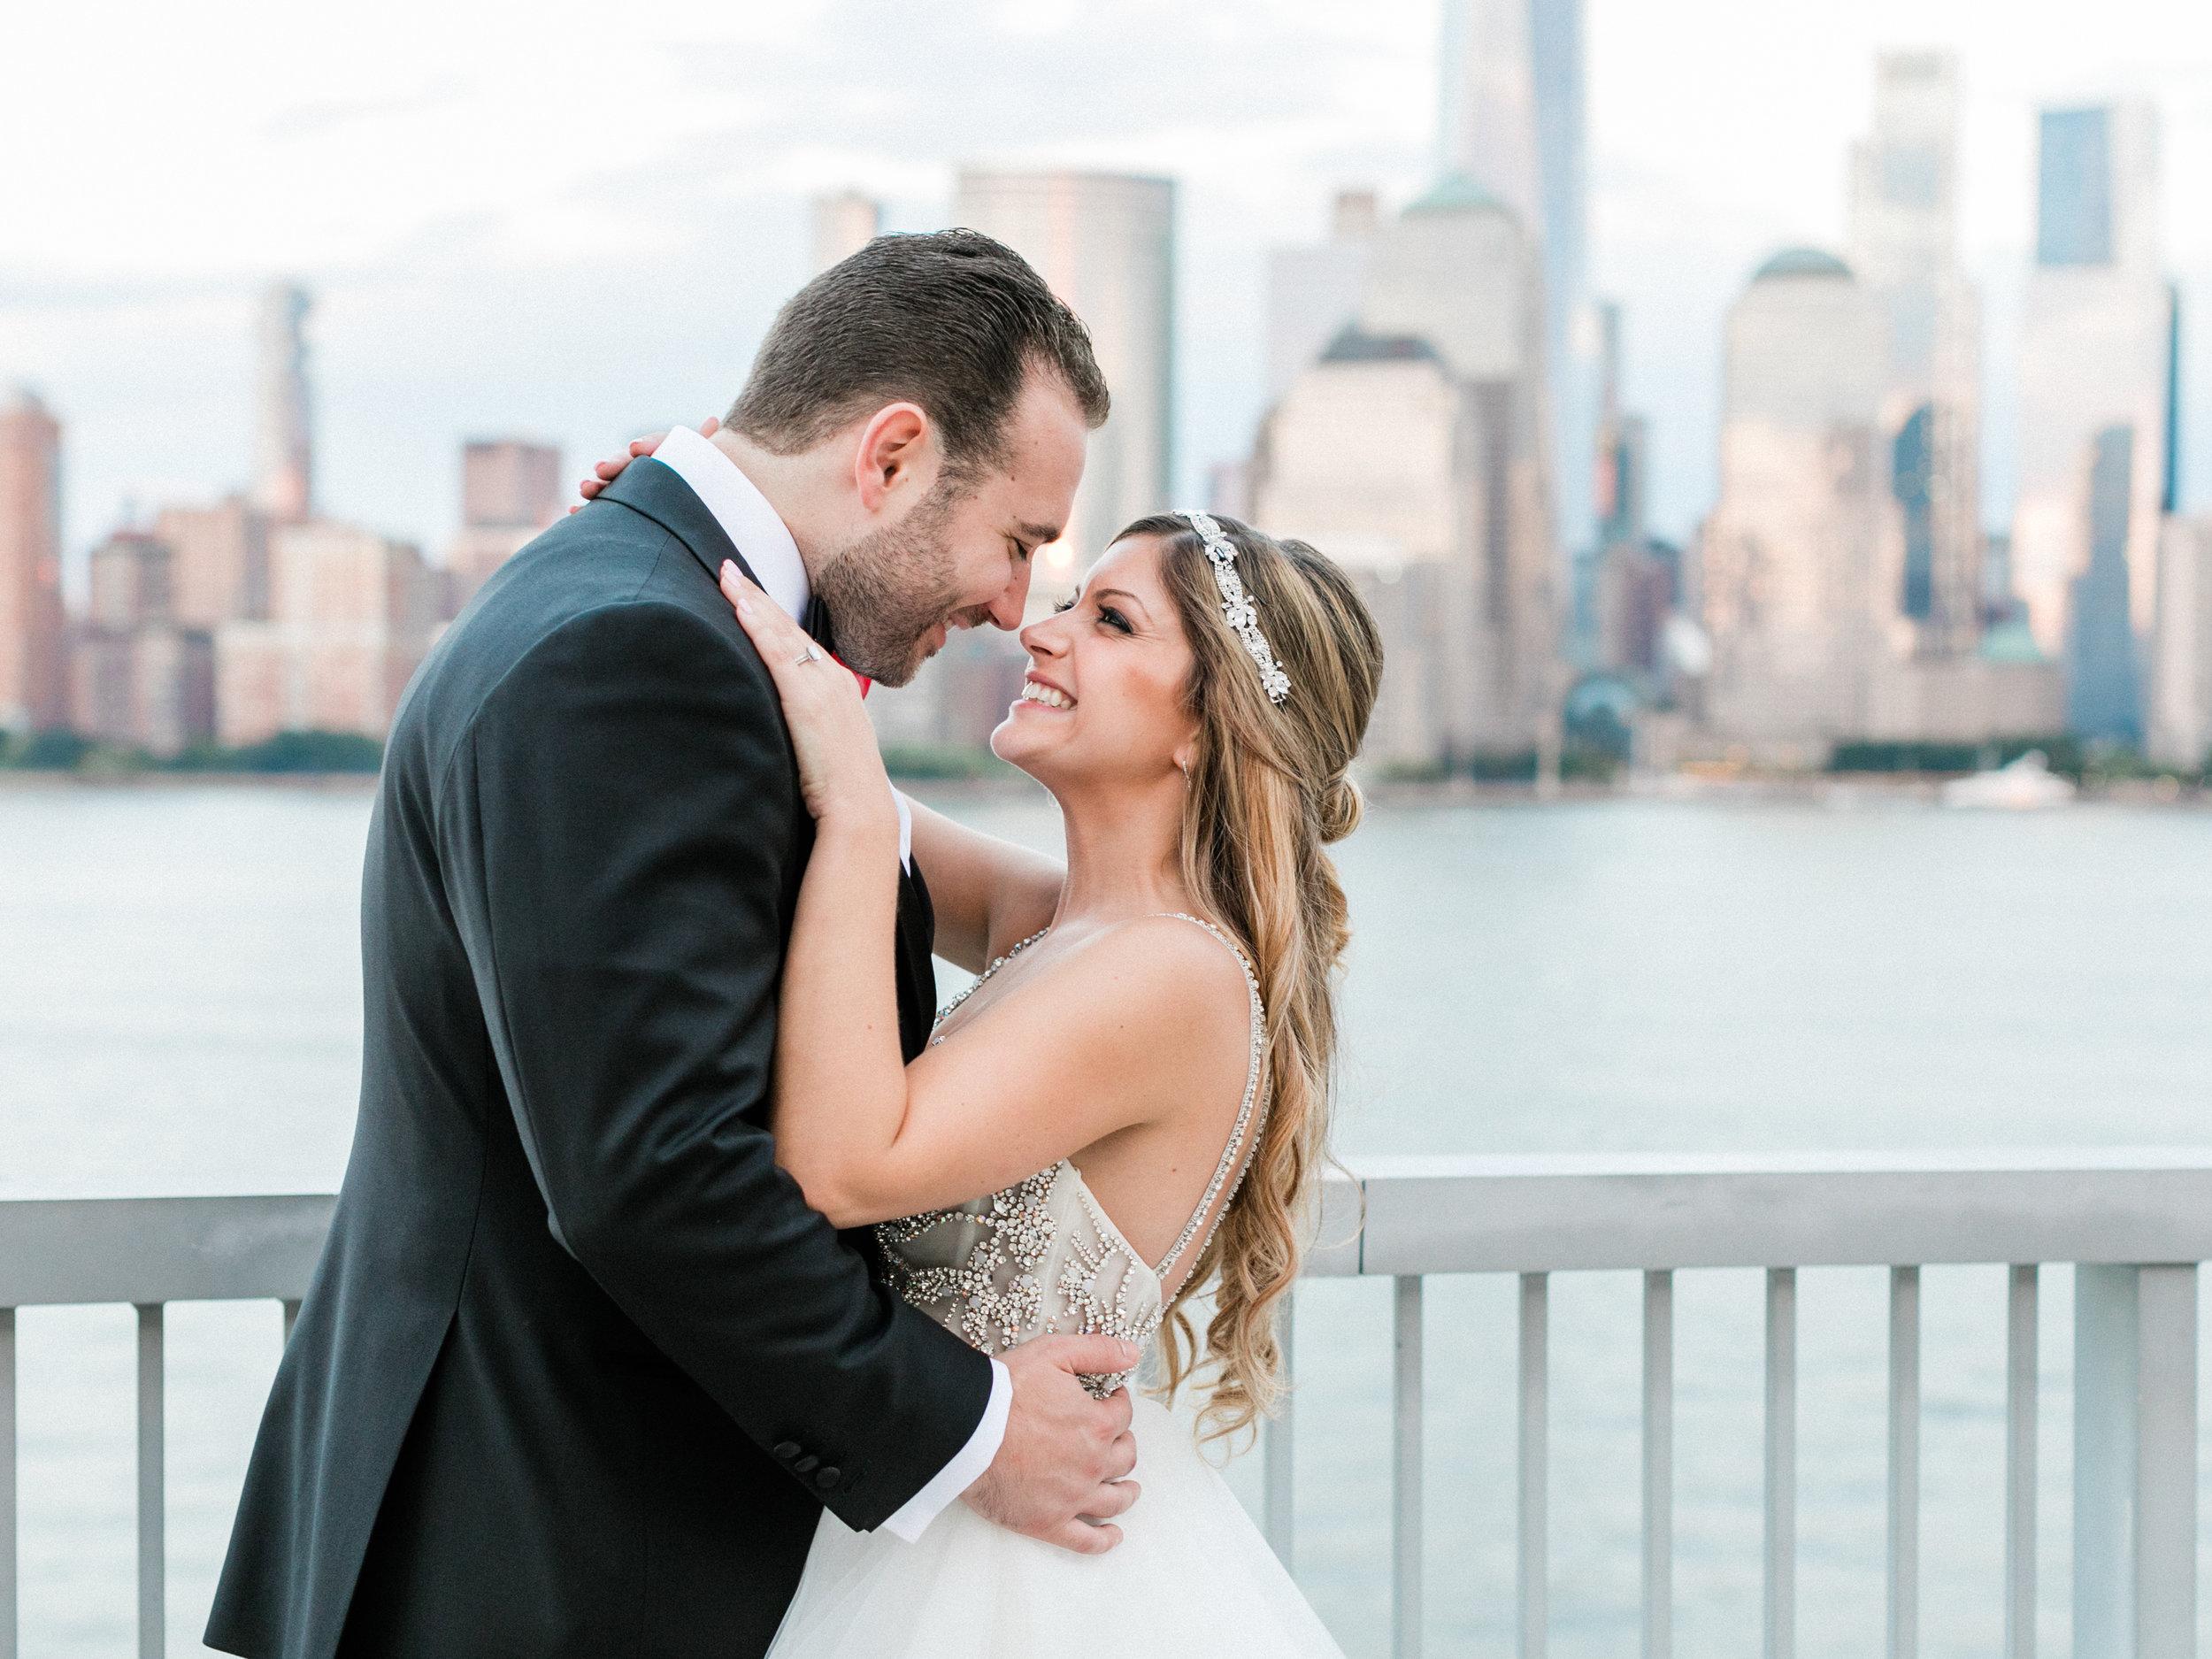 hyatt-regency-jersey-city-wedding-photographer60.jpg